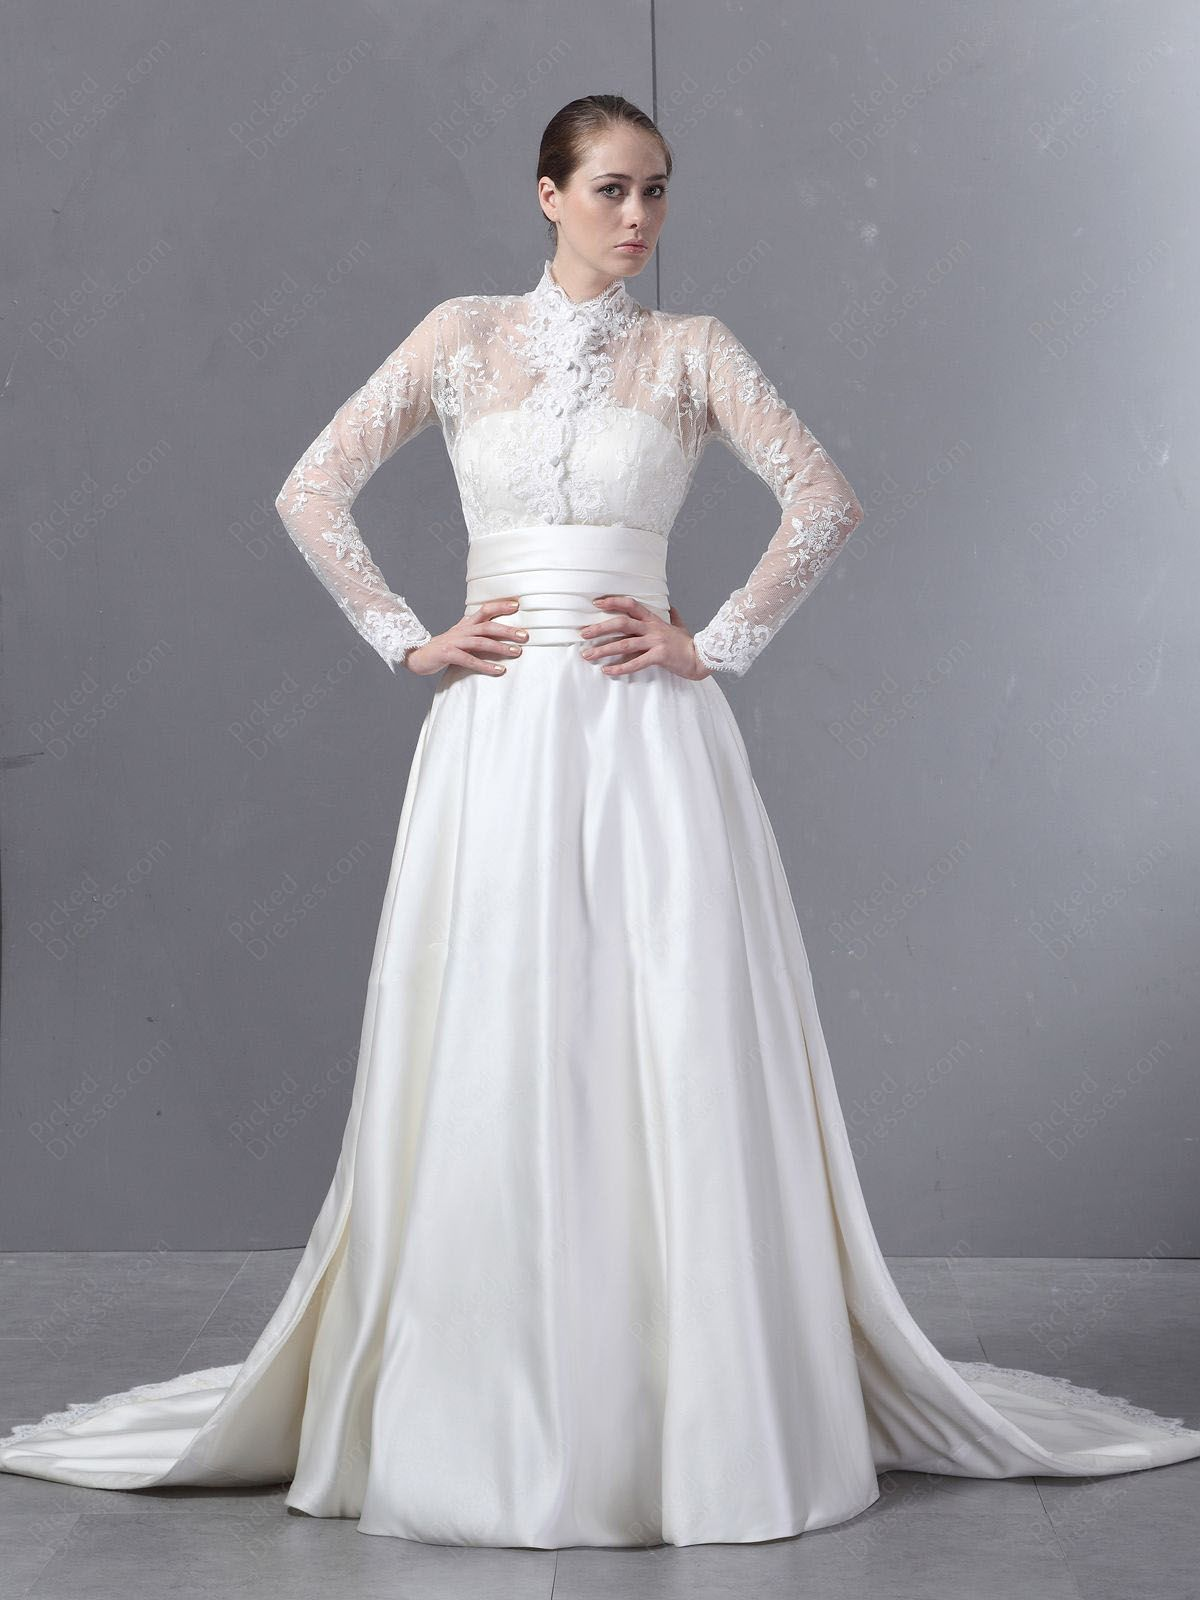 Lace Wedding Dress Dresses, Ivory lace wedding dress